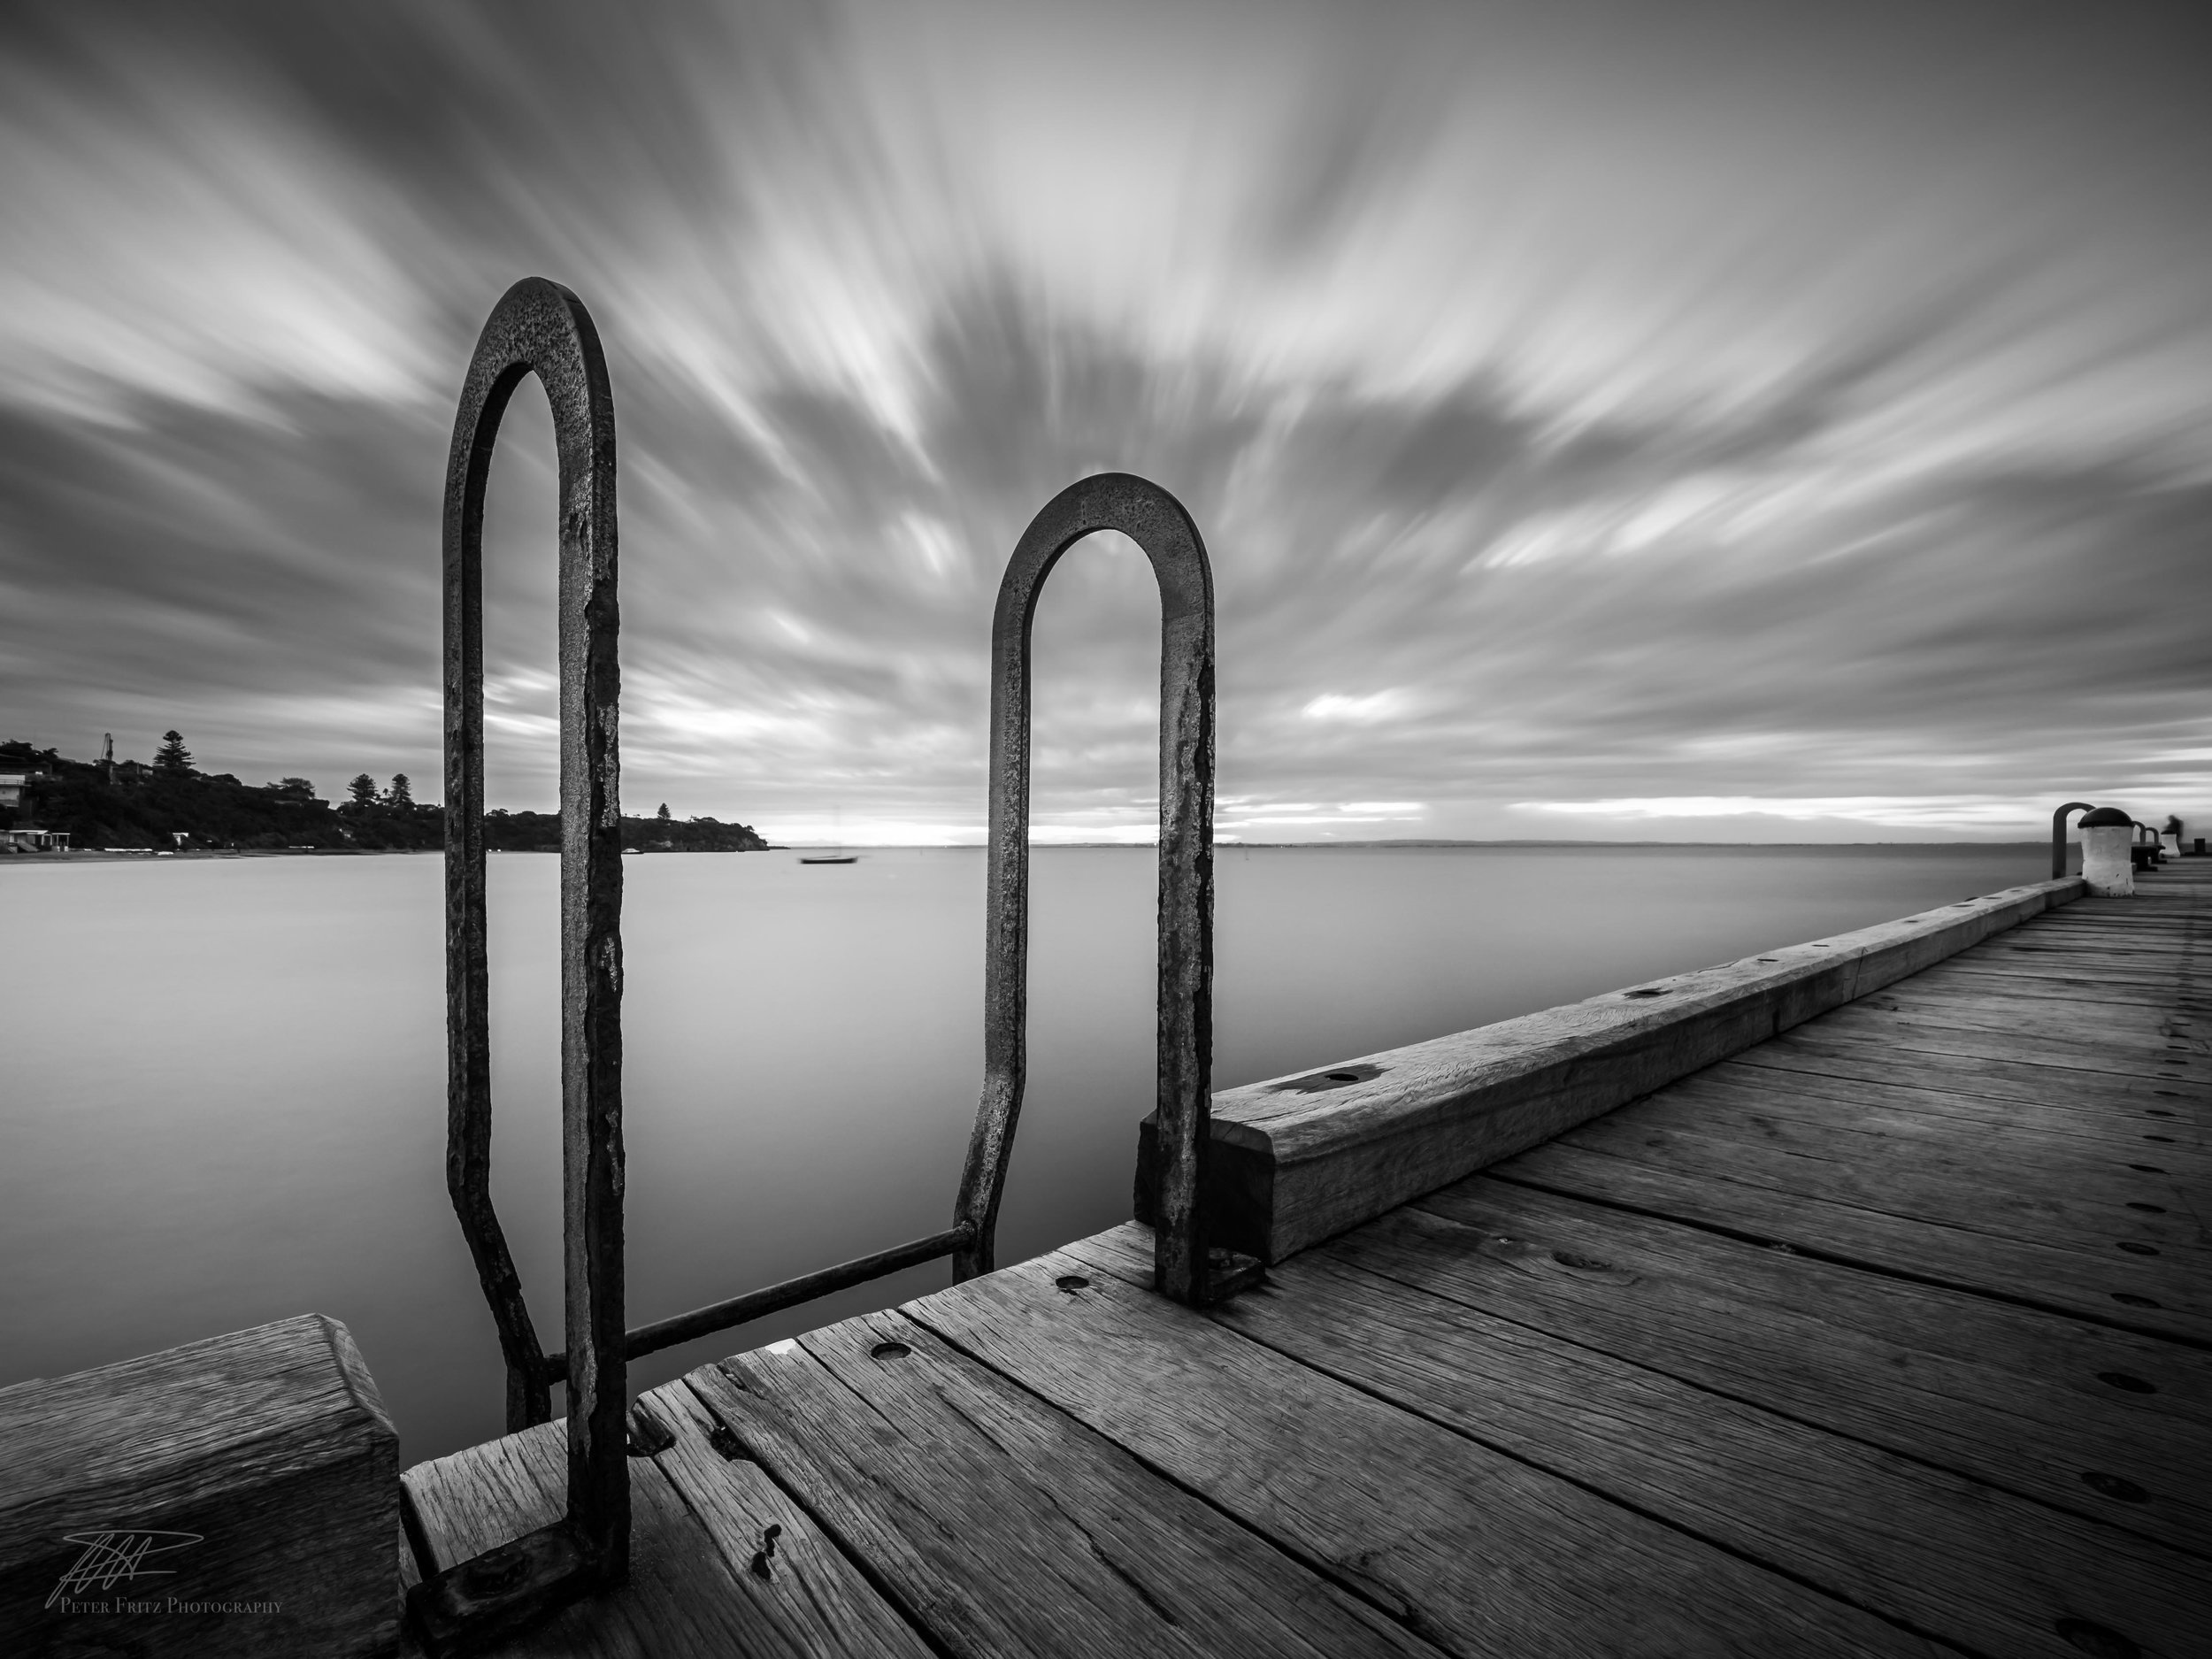 Portsea handrails